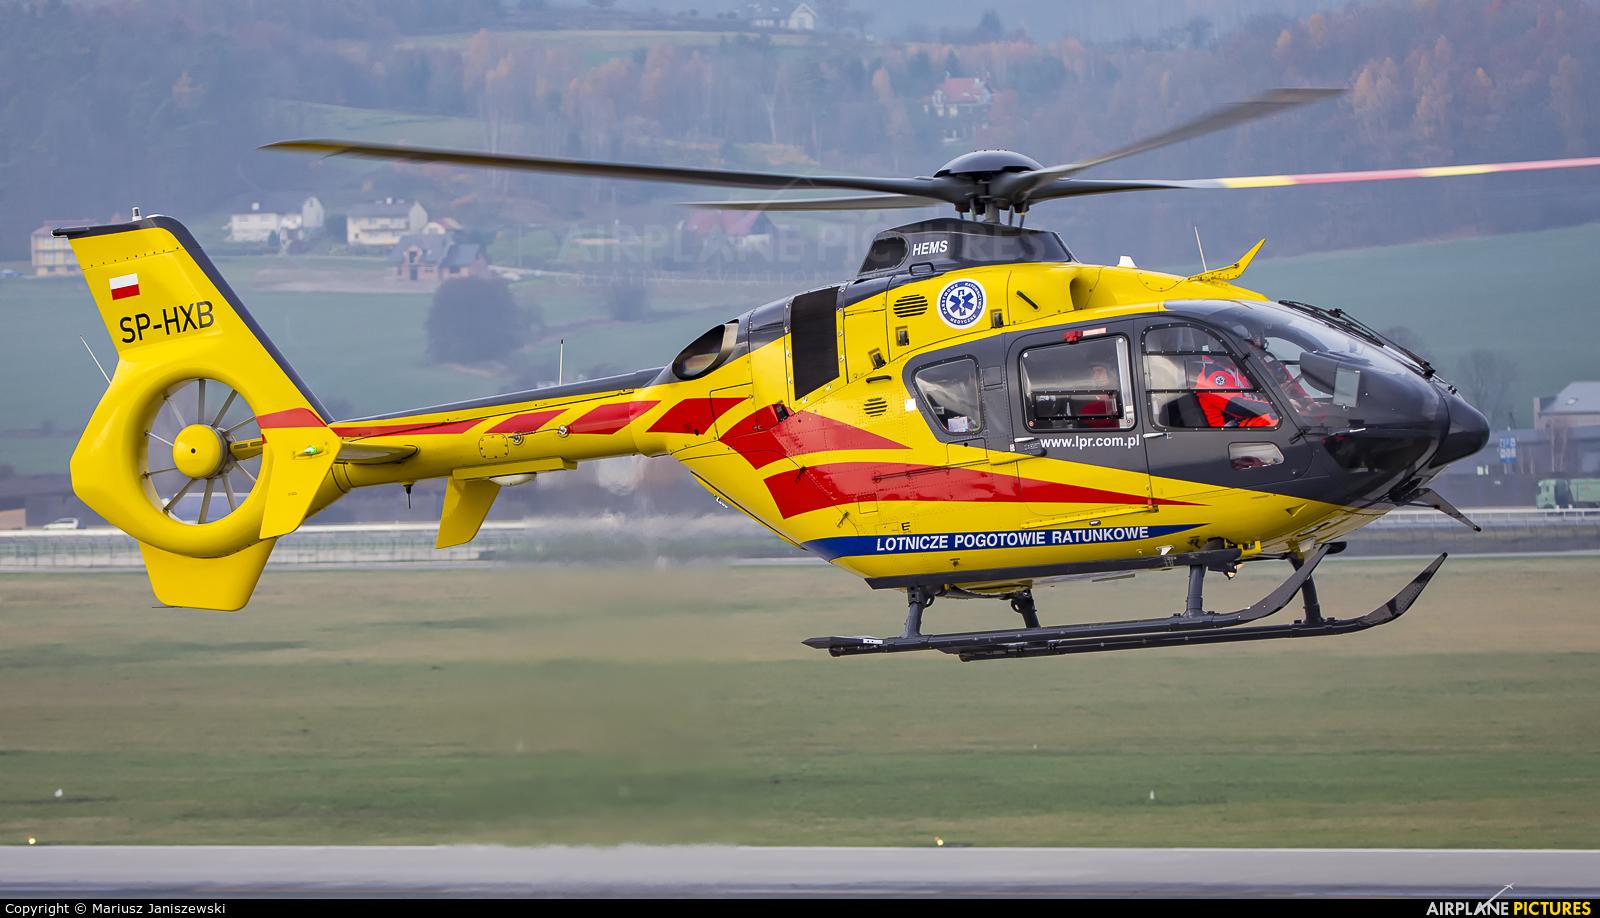 Polish Medical Air Rescue - Lotnicze Pogotowie Ratunkowe SP-HXB aircraft at Kraków - John Paul II Intl